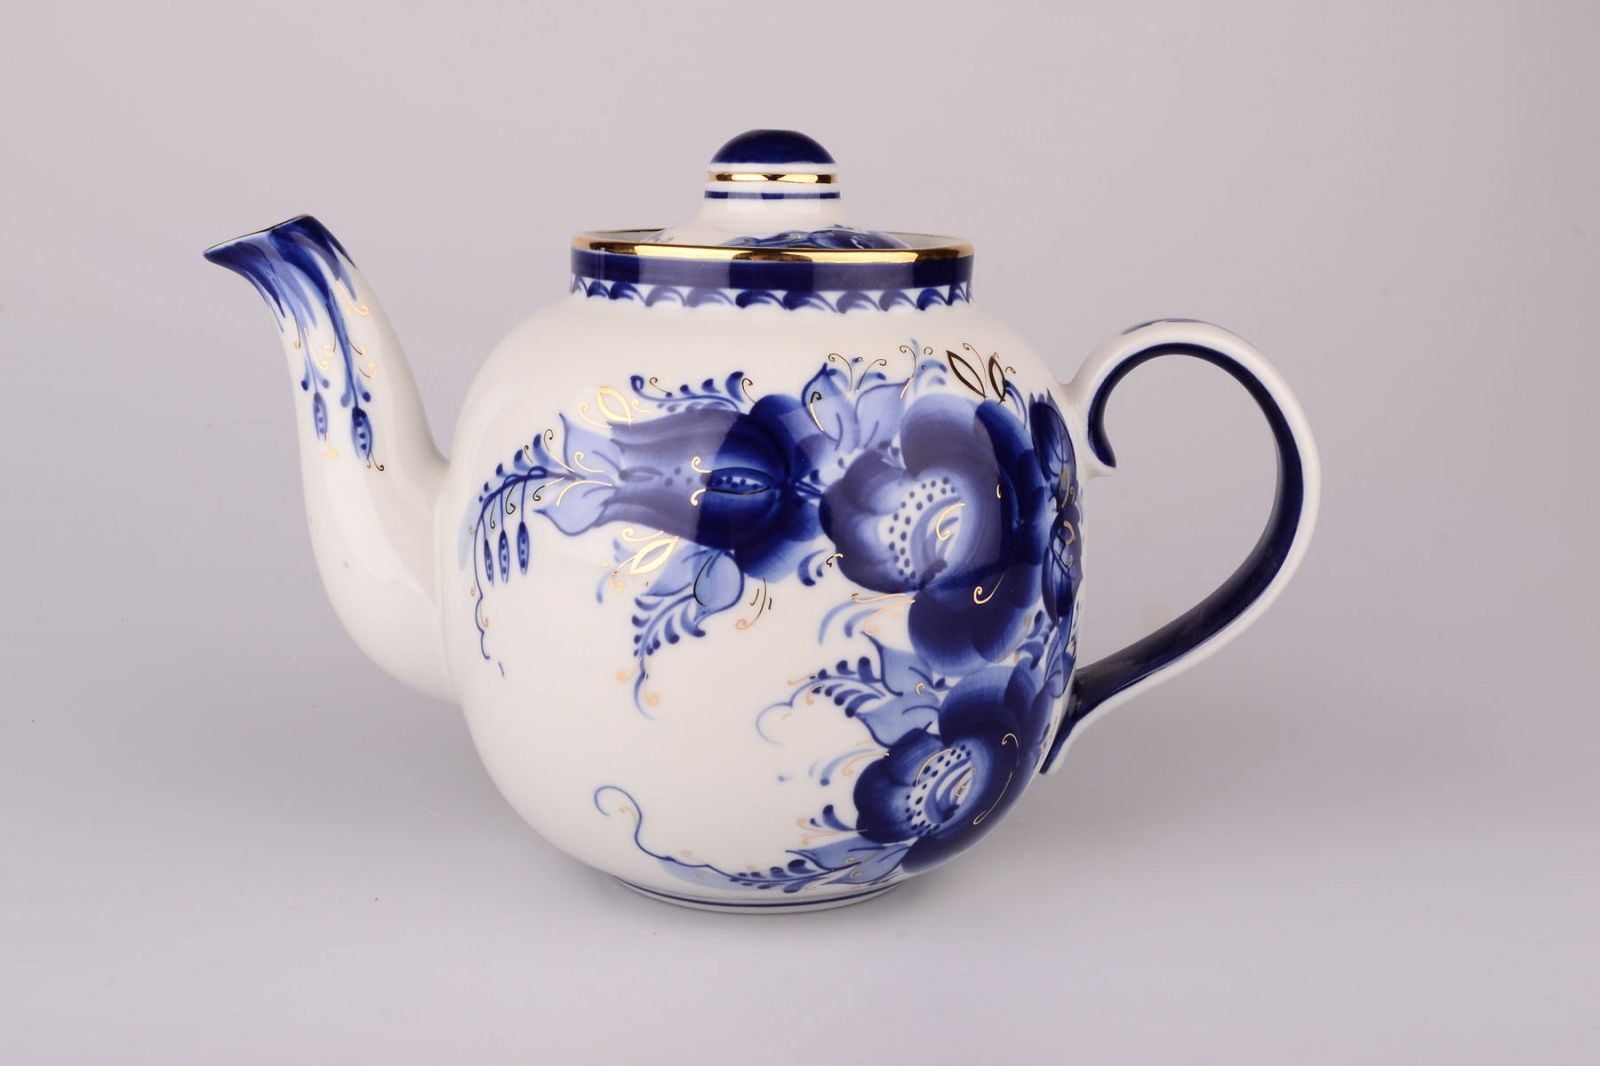 Dulevo porcelain / Teapot 1400 ml Amber Flowers Gold